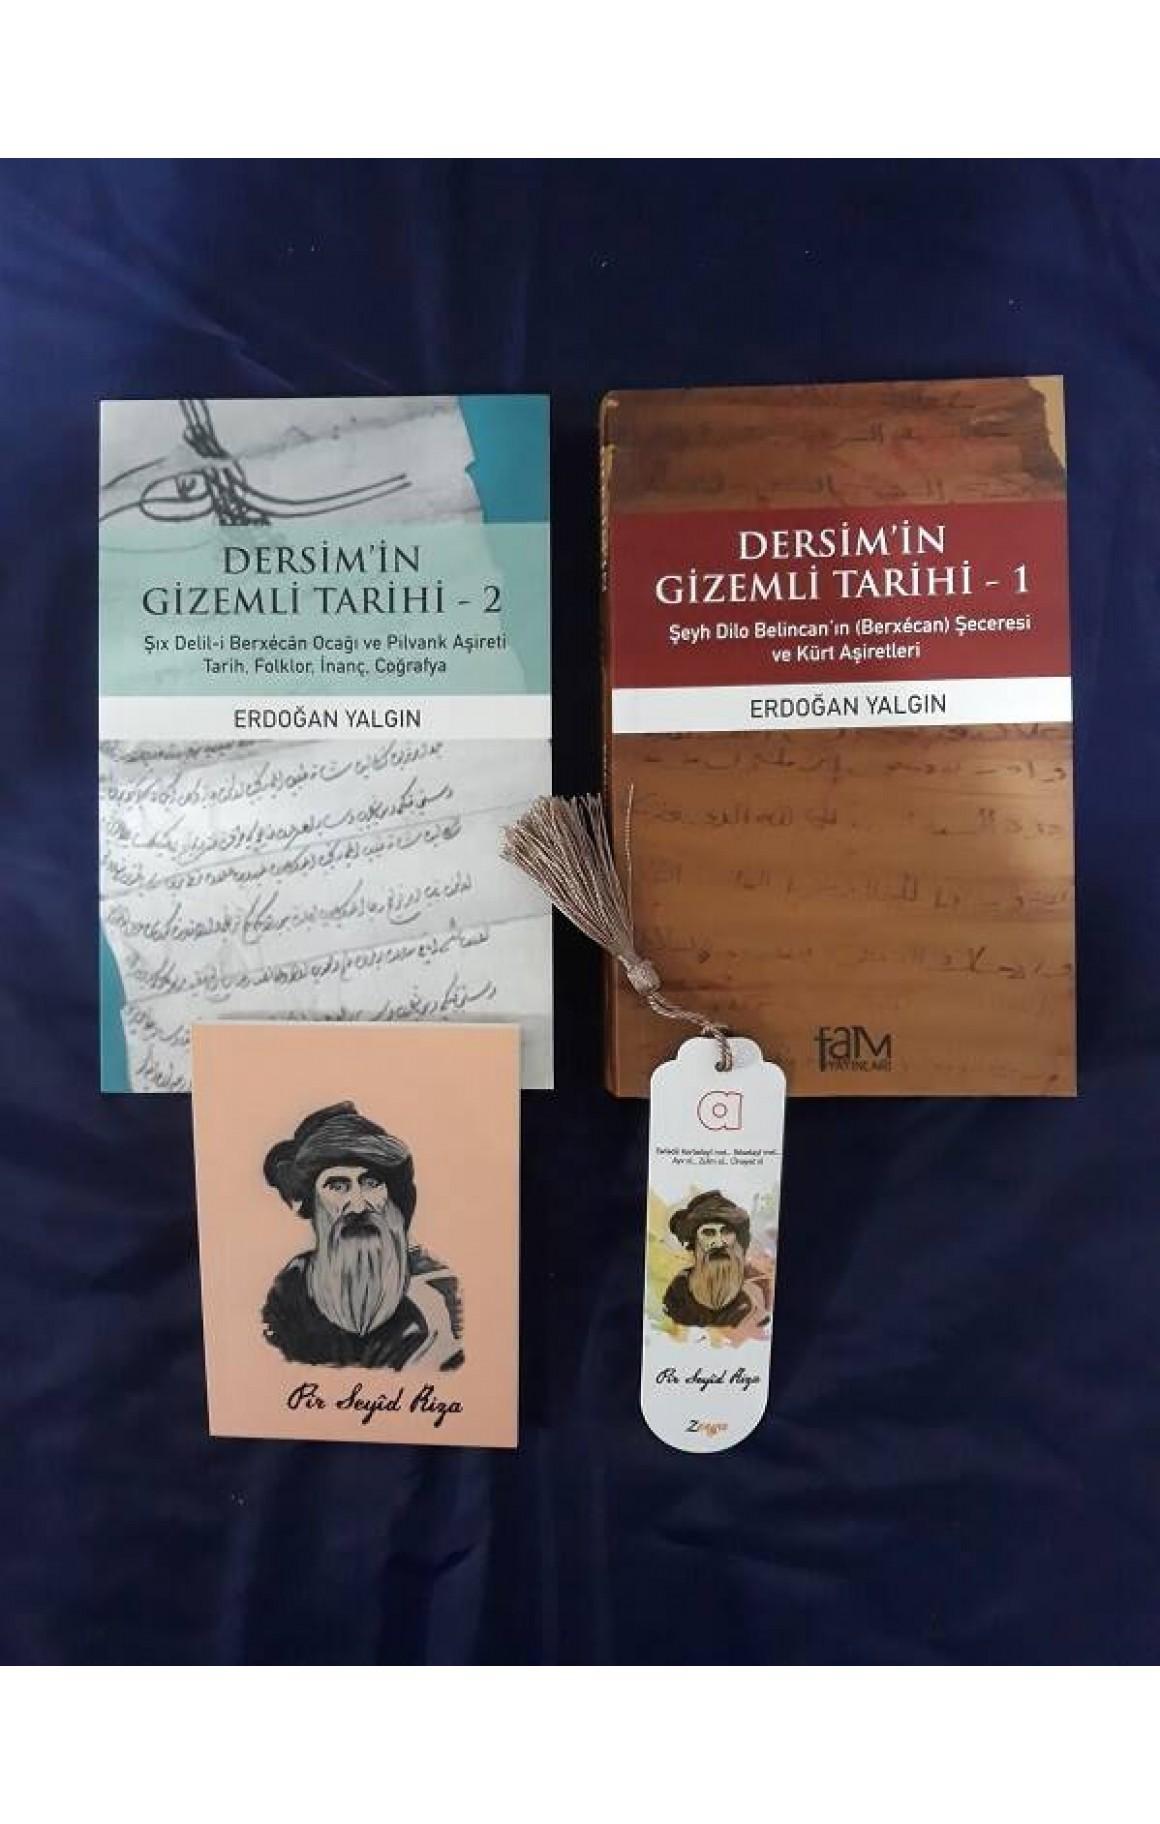 Dersim'in Gizemli Tarihi Seti (defter+ayraç)